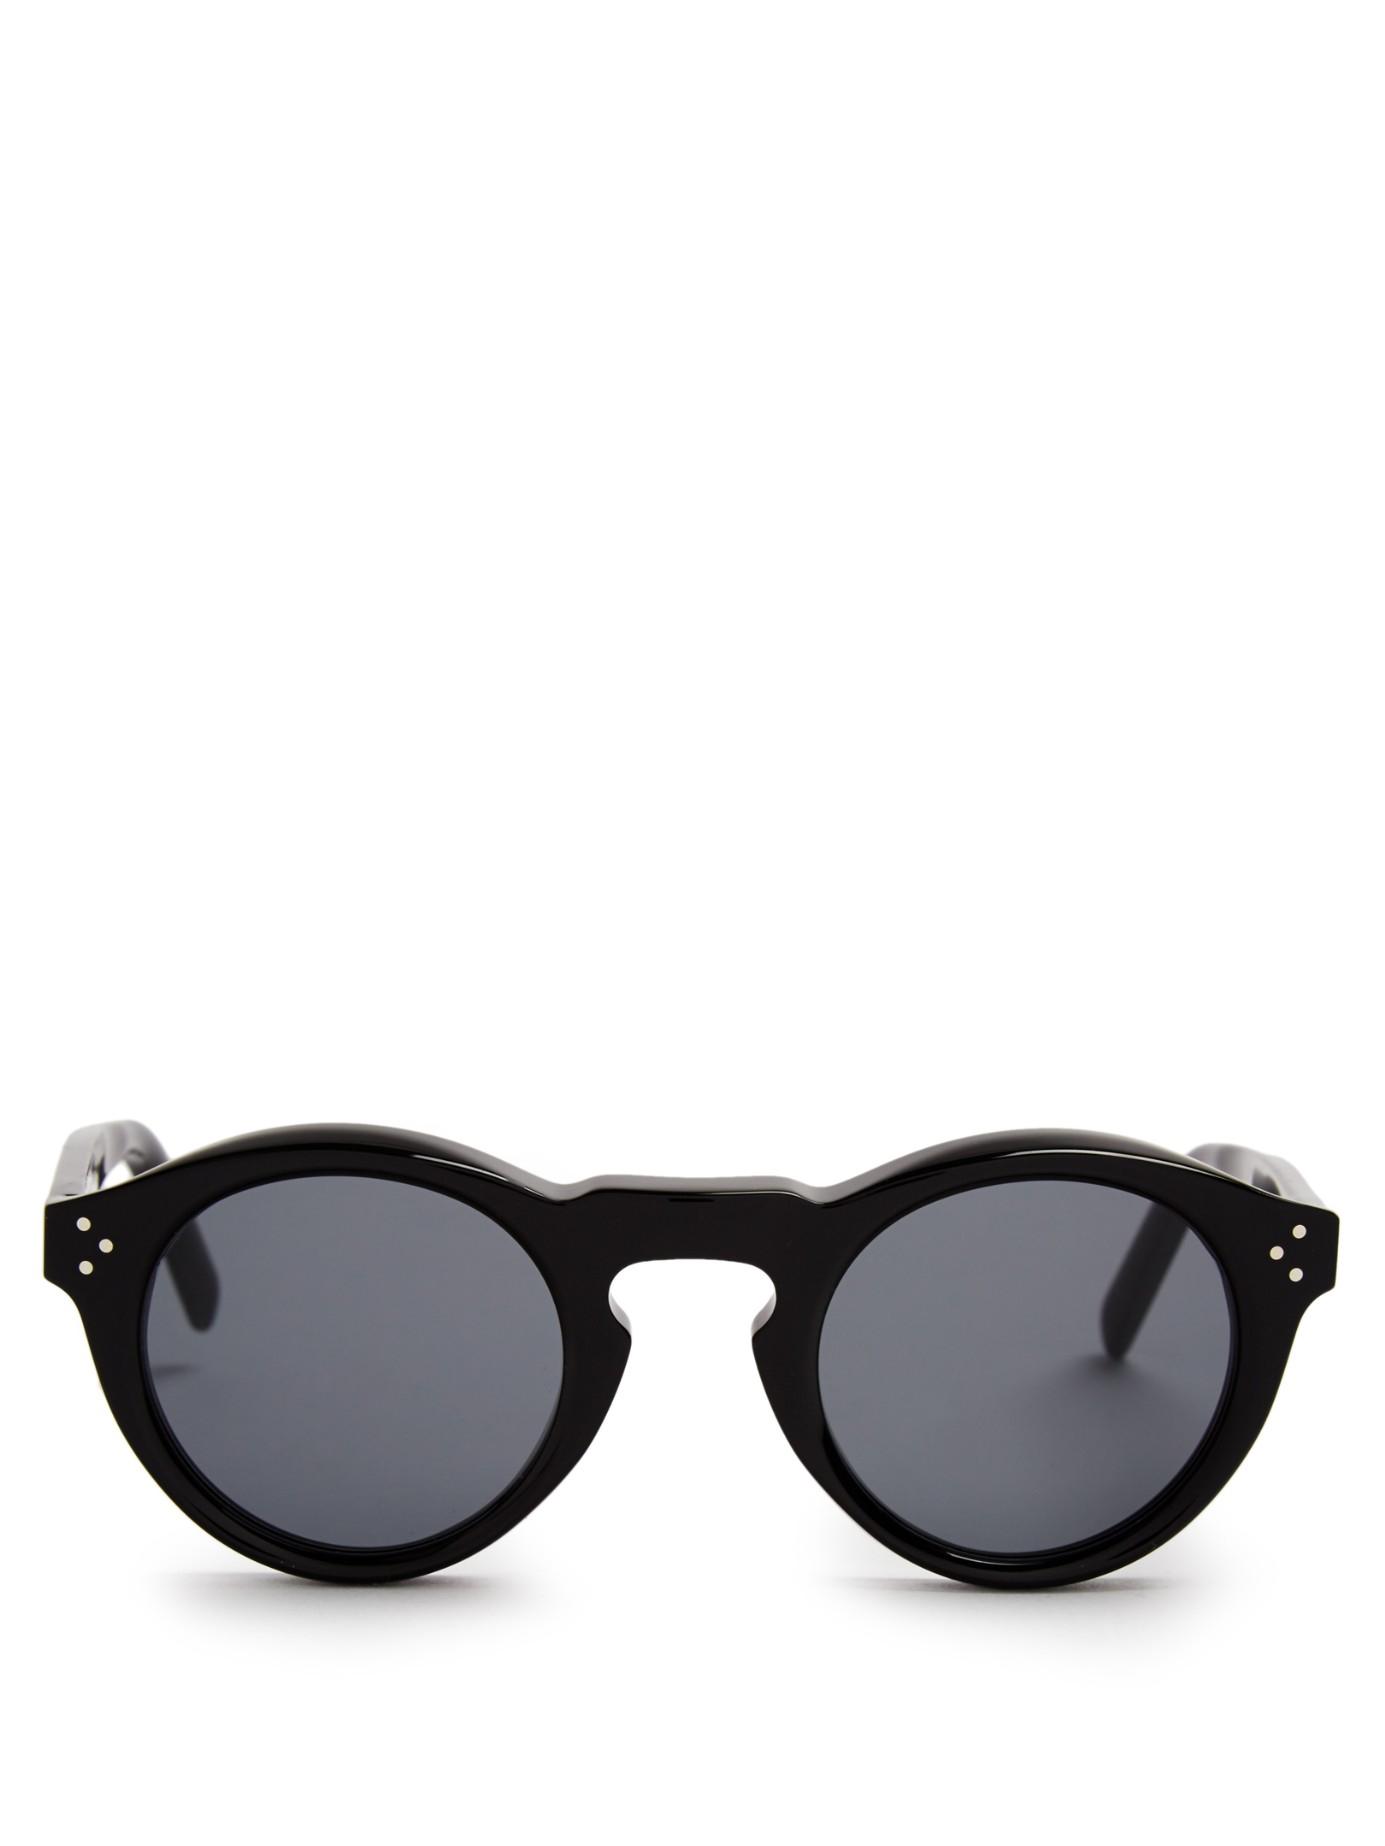 f981048cca01 Celine Sunglasses Zurich